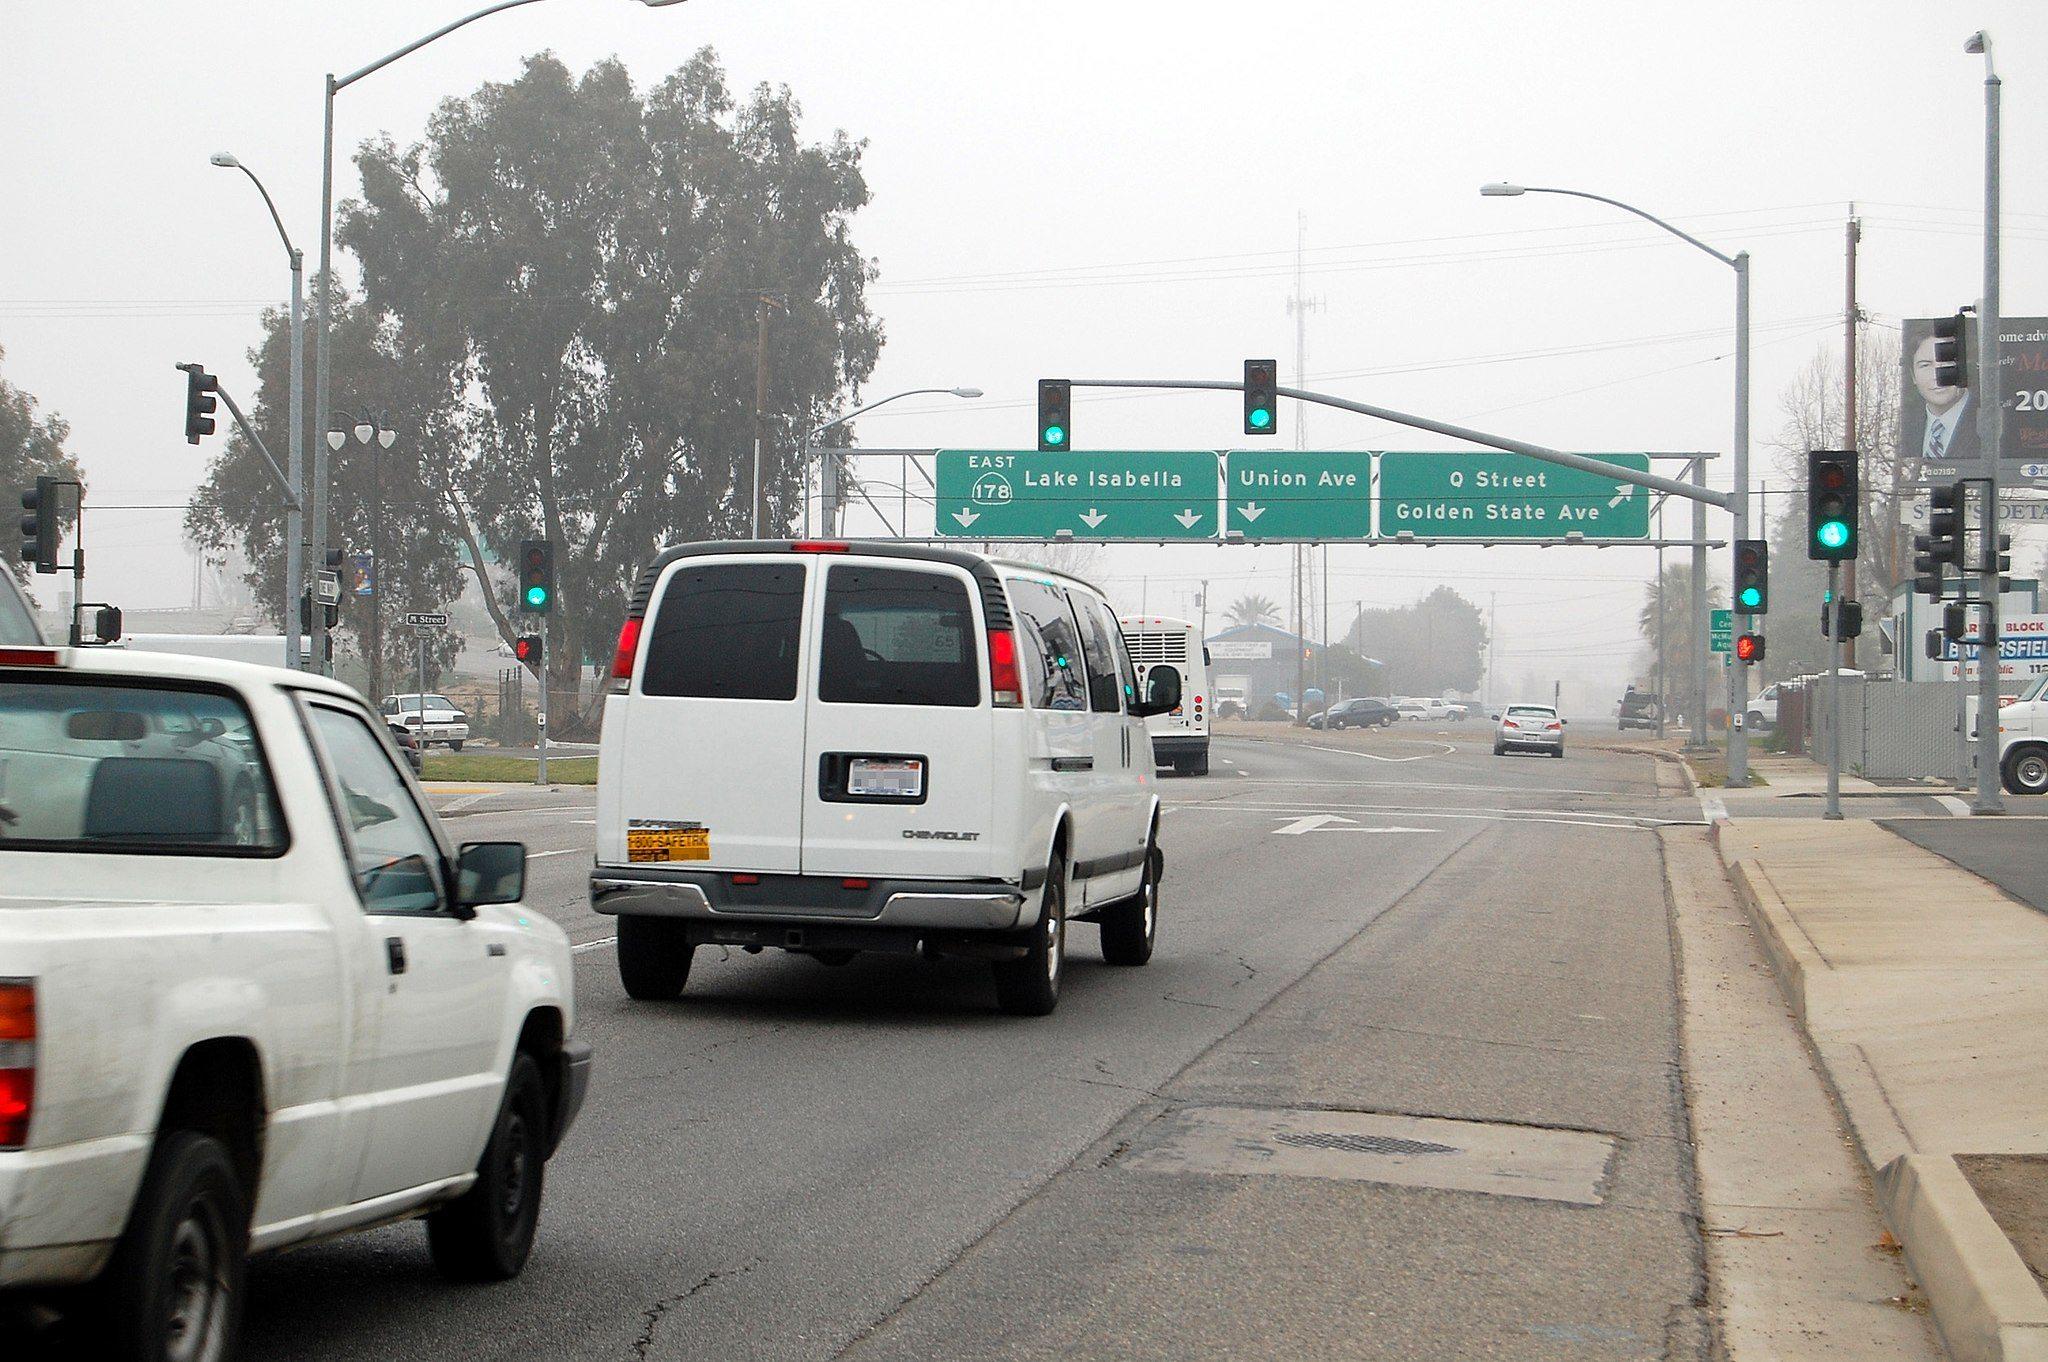 Deadliest cities for pedestrians-Bakersfield CA